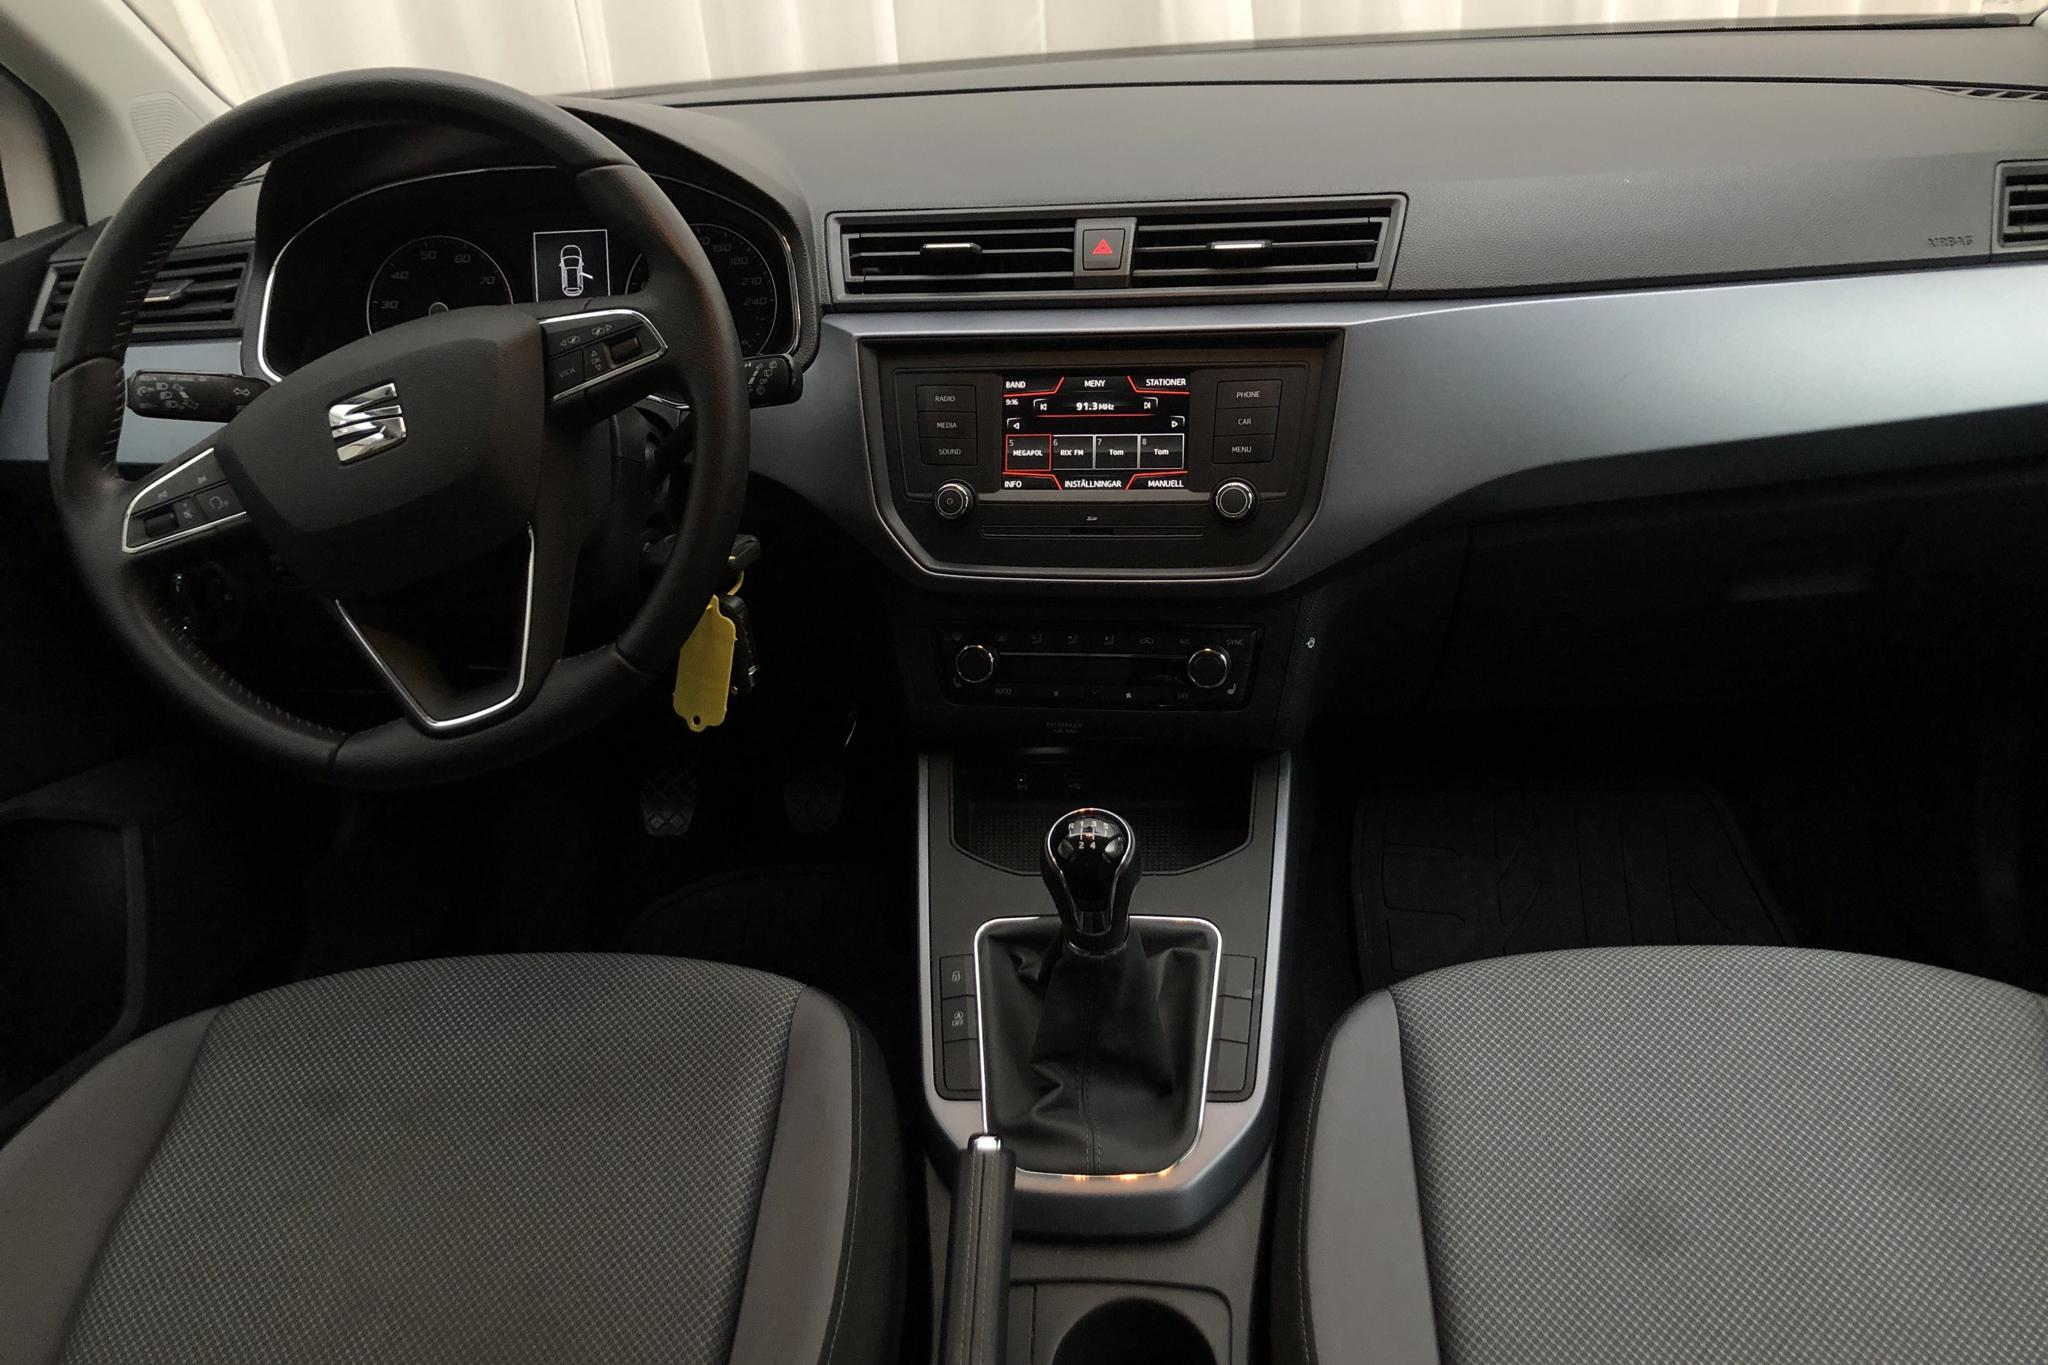 Seat Arona 1.0 TSI 5dr (95hk) - 55 770 km - Manual - white - 2018